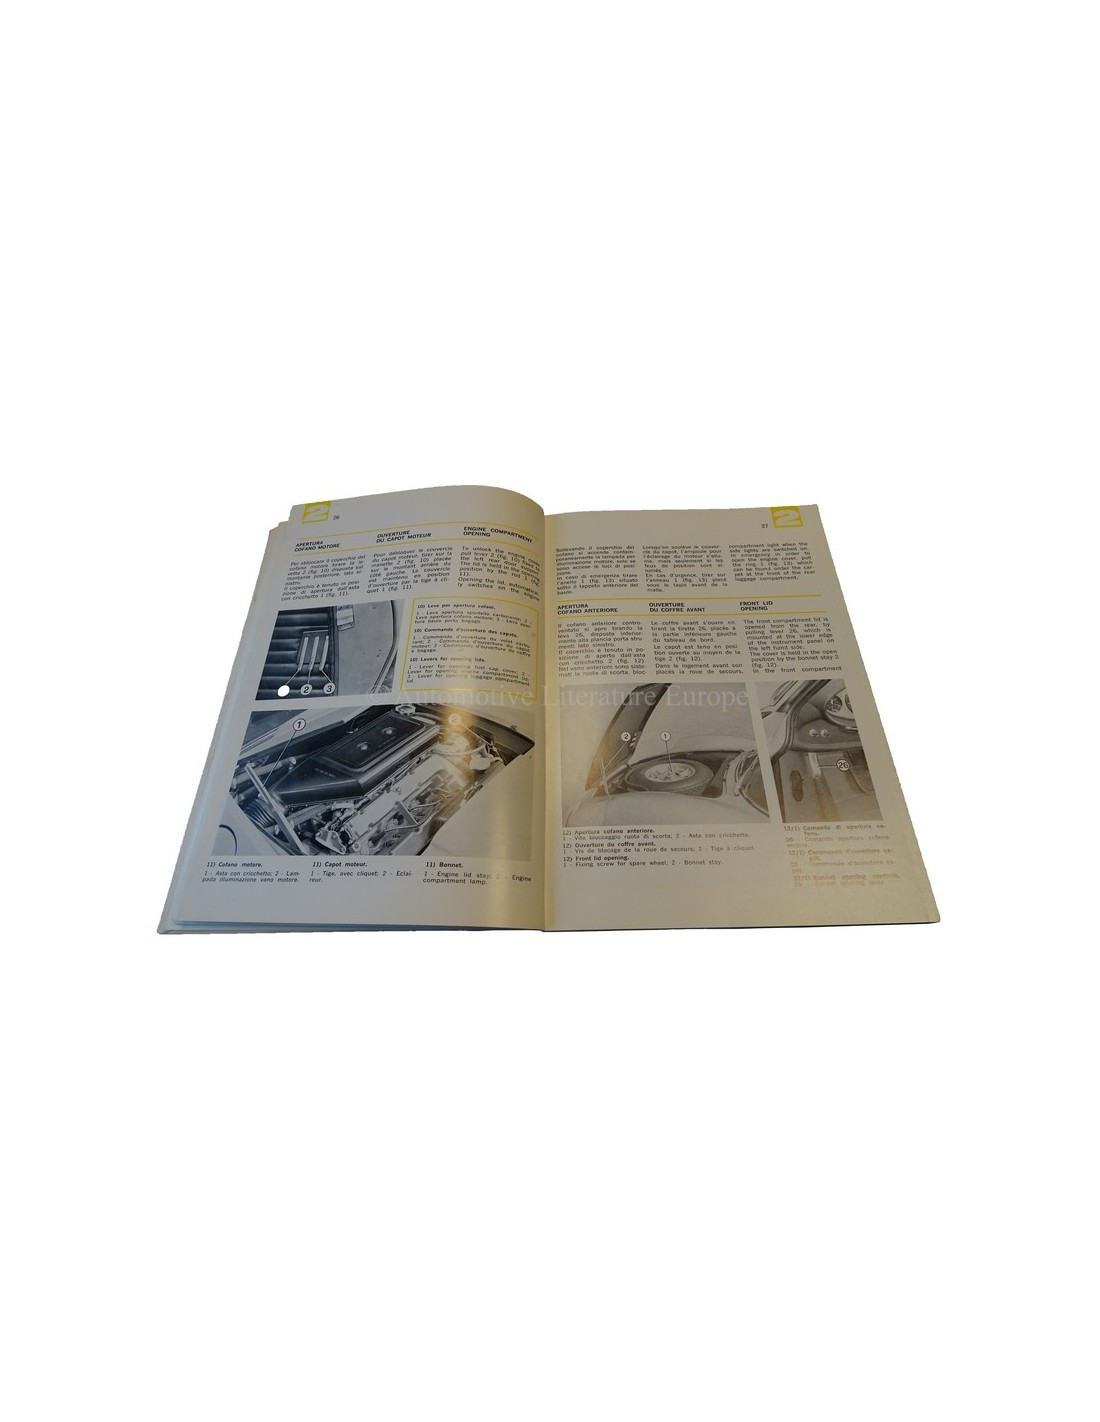 Ferrari Repair Manuals: 1972 FERRARI DINO 246 GT OWNERS MANUAL